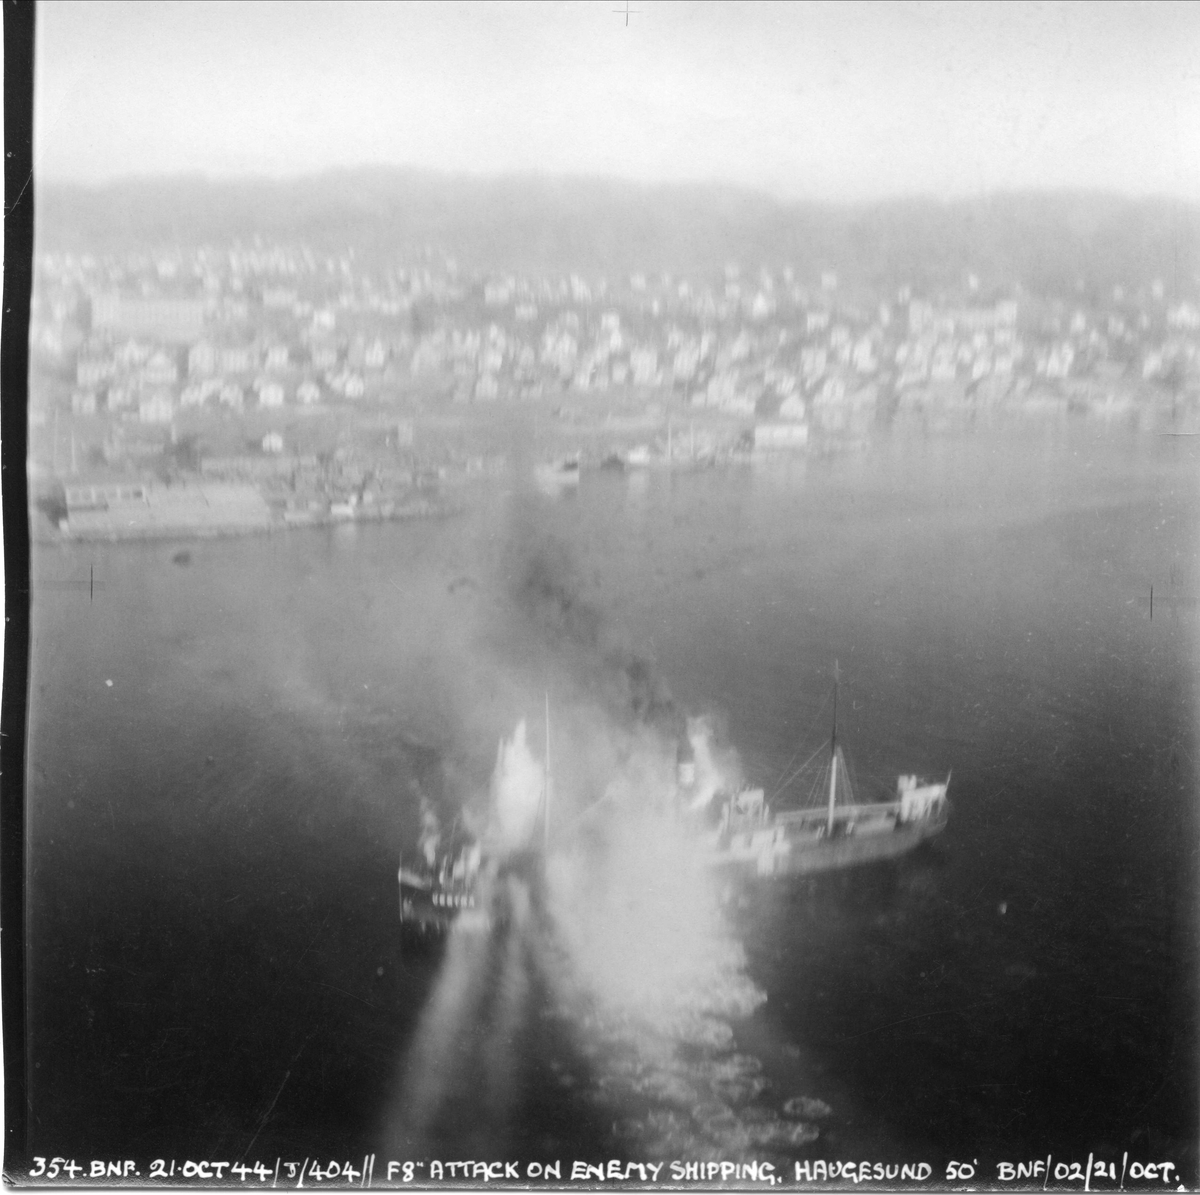 Fly fra 404 skvadronen angriper fiendtlige skip i Haugesund, 21. oktober 1944.